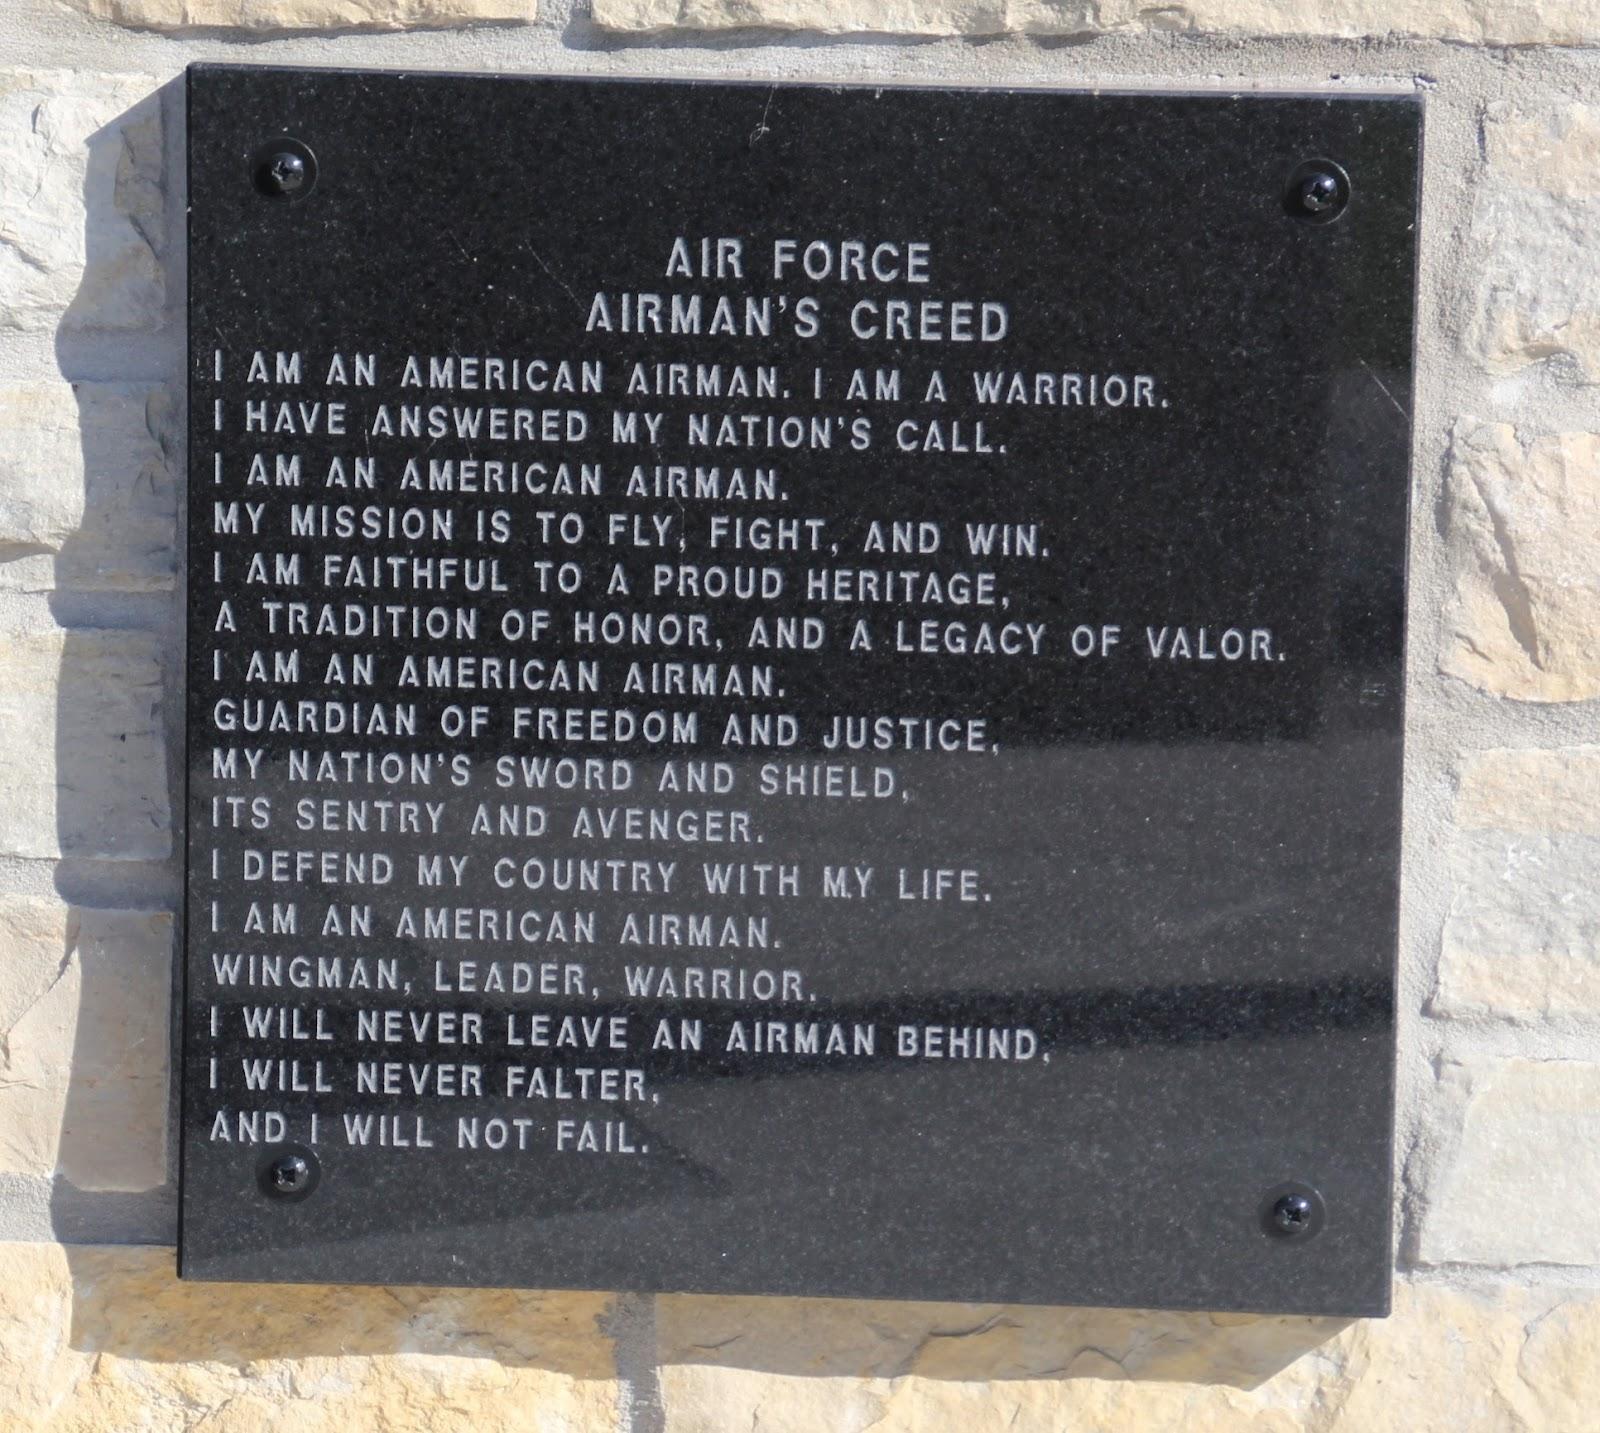 Wisconsin historical markers veterans memorial park of oconomowoc veterans memorial park of oconomowoc air force airmans creed altavistaventures Images